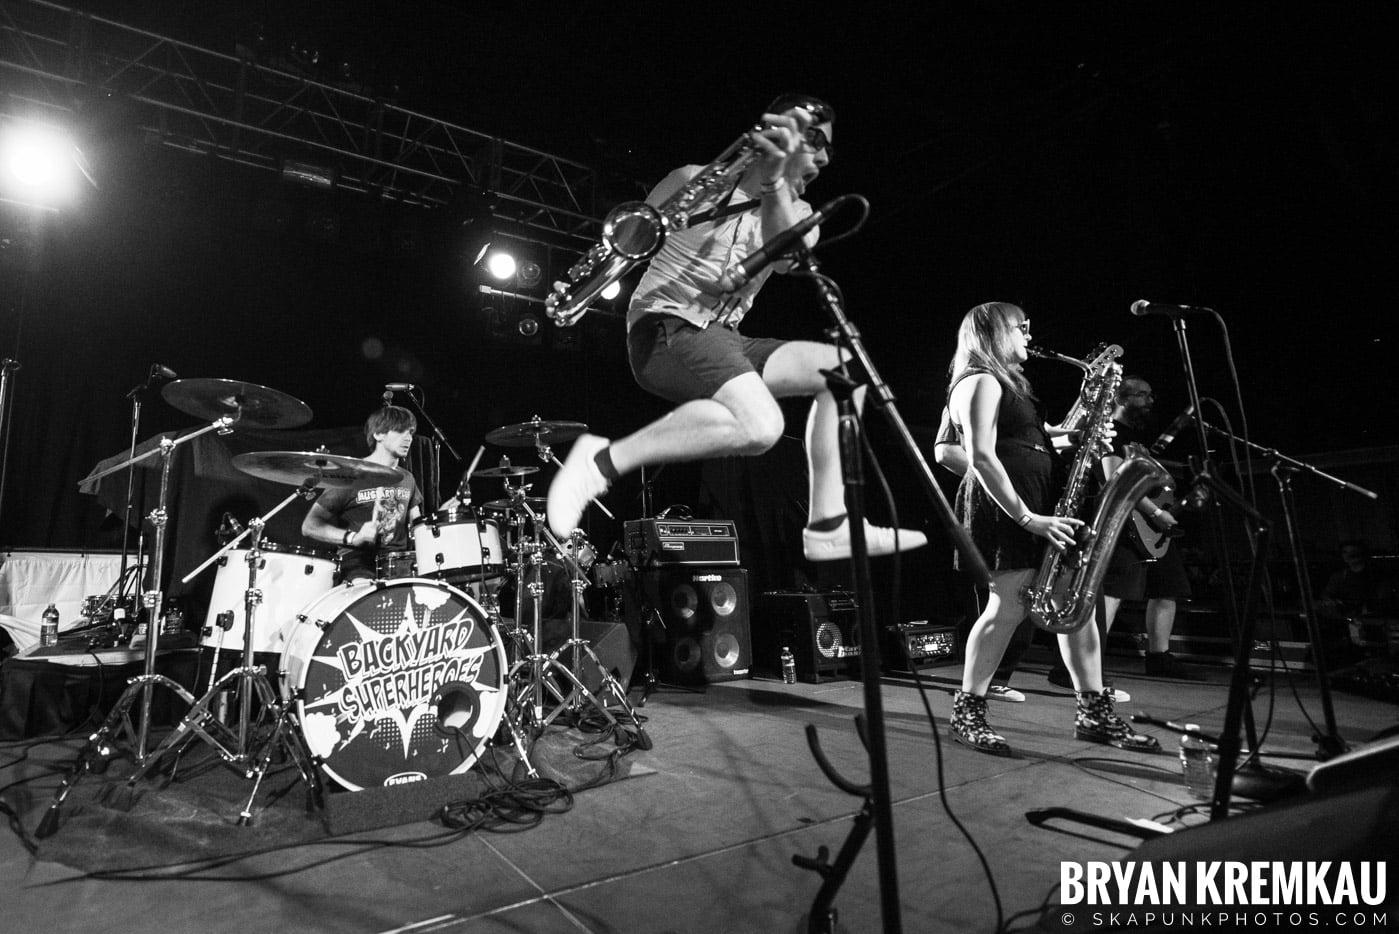 Backyard Superheroes @ Starland Ballroom, Sayreville, NJ - 7.29.17 (15)